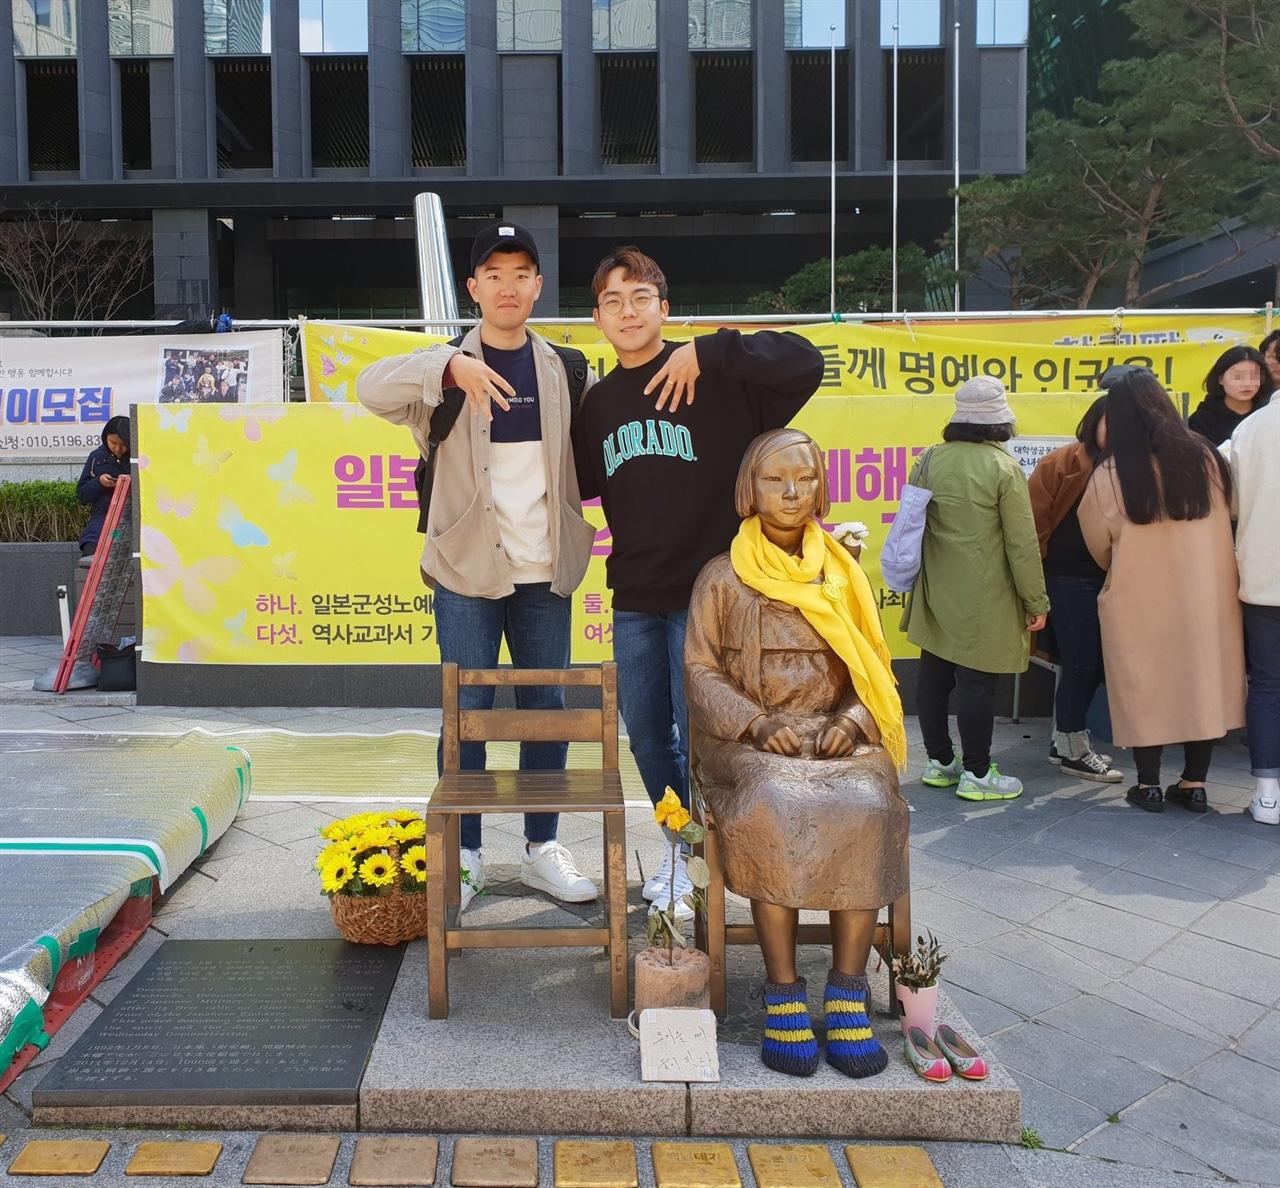 3A Project 3A Project에 참여하는 이호준(좌)씨와 백현재(우)씨